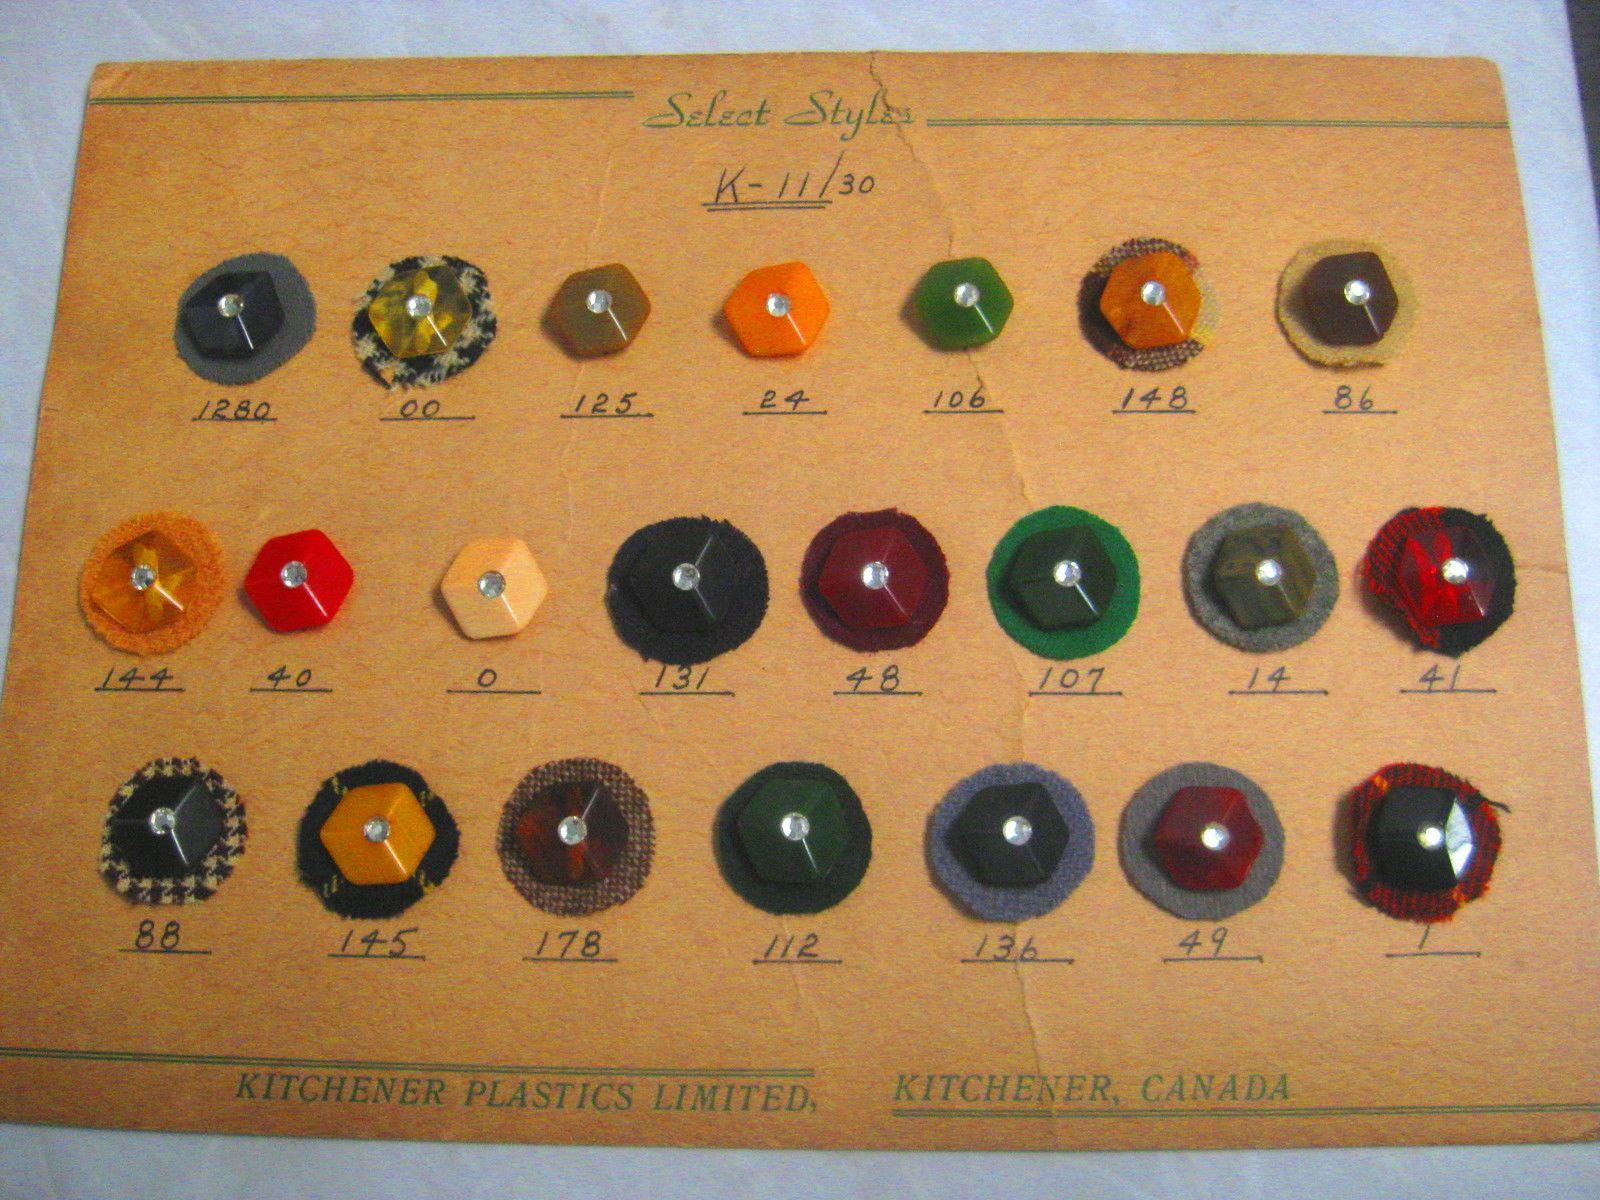 ButtonArtMuseum.com - Collectible Salesman's Sample Bakelite Buttons with Rhinestones | eBay